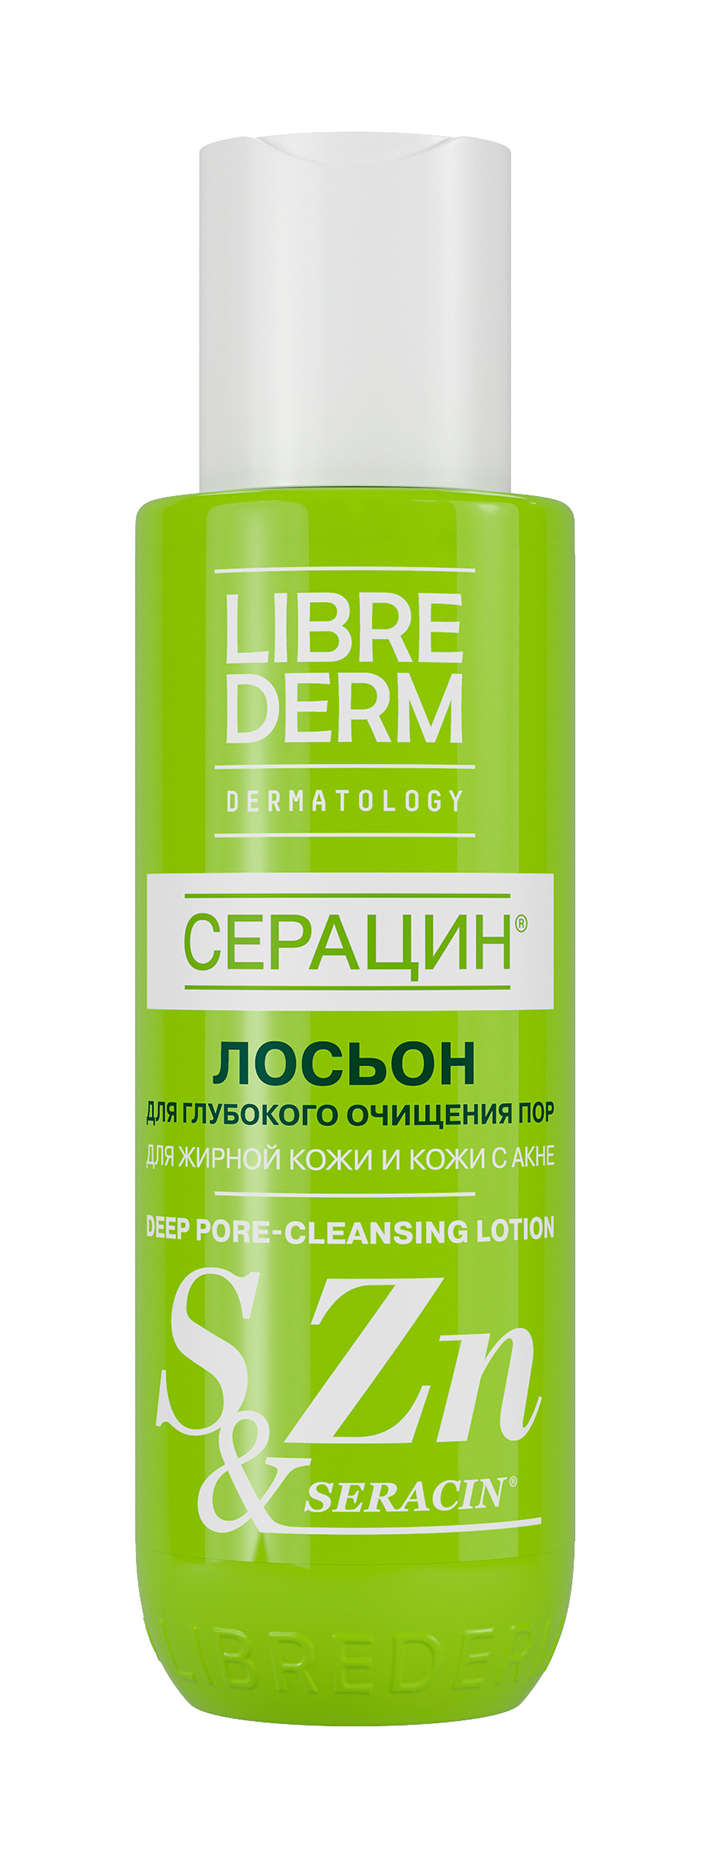 Купить Лосьон LIBREDERM Seracin Deep Pore-Сleansing Lotion For Oily and Acne-Prone Skin, 200мл